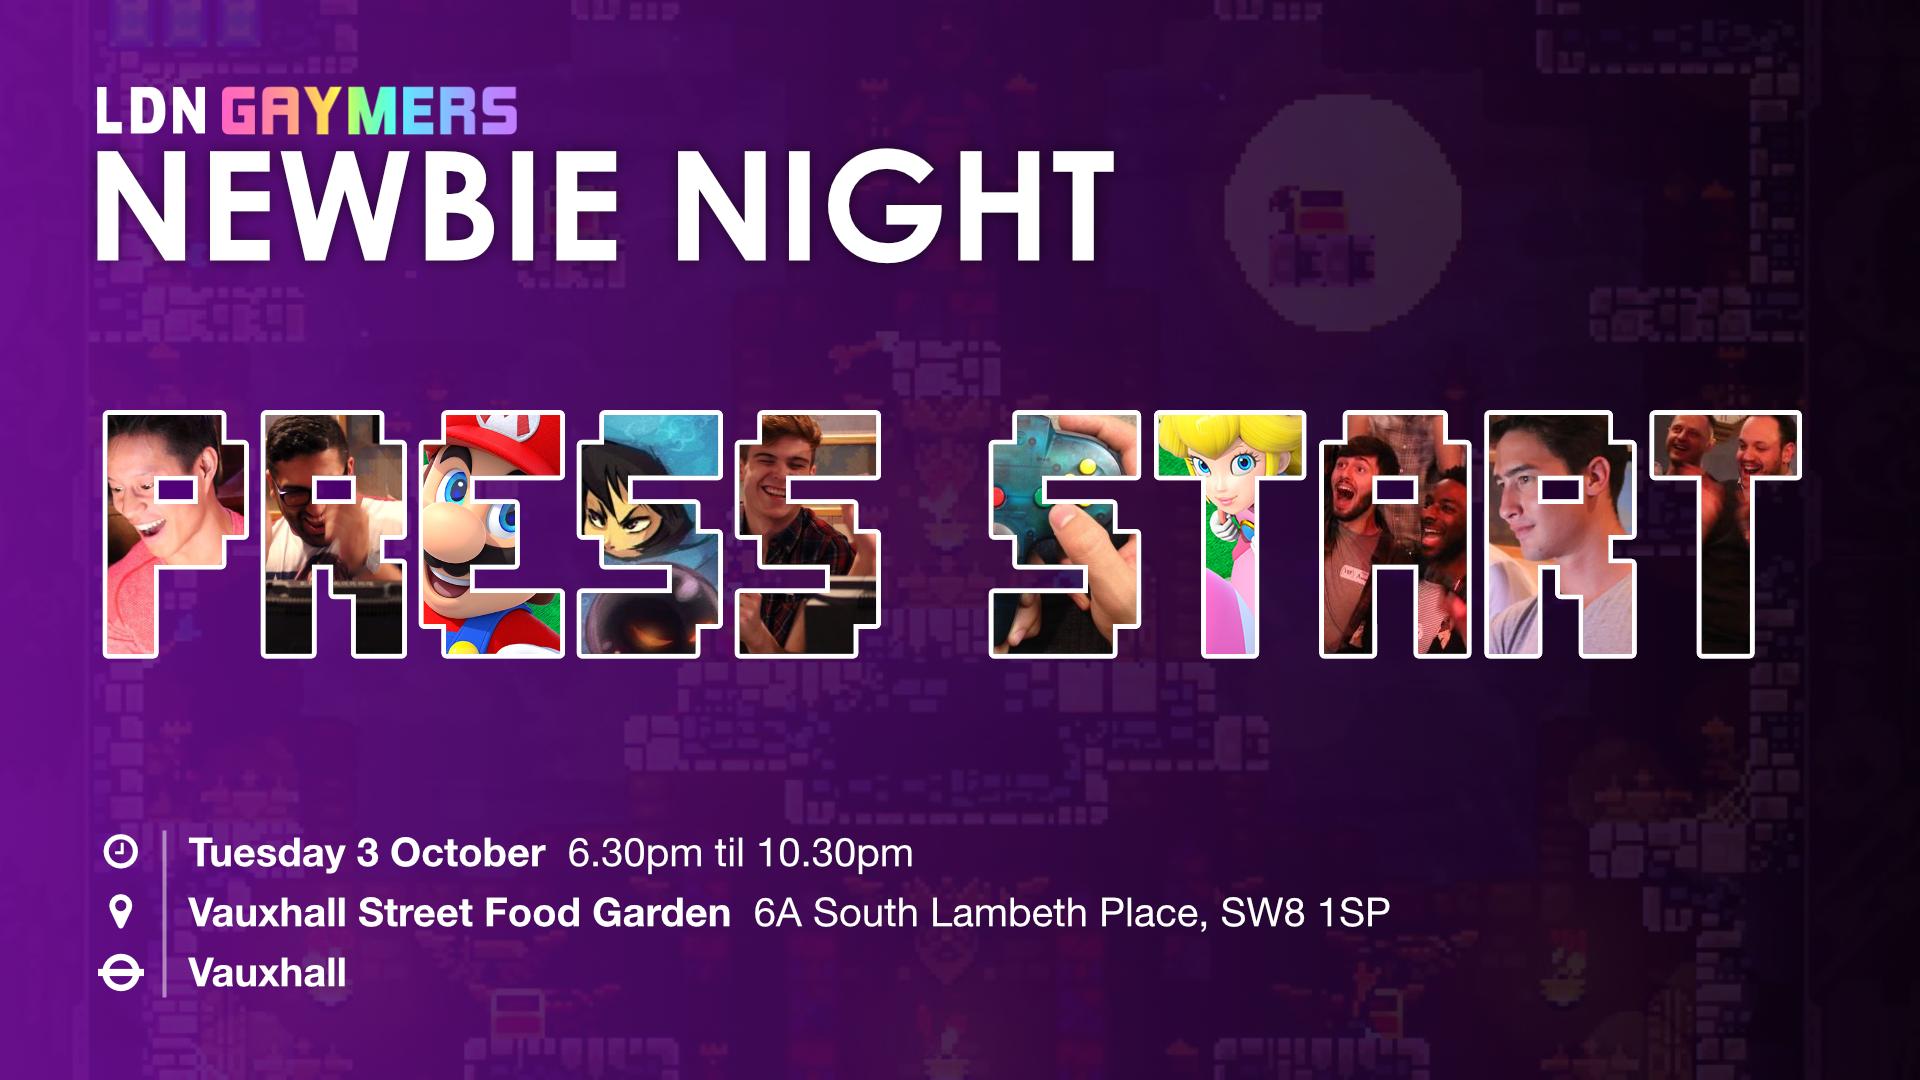 LDN Gaymers: Newbie Night (October 2017)